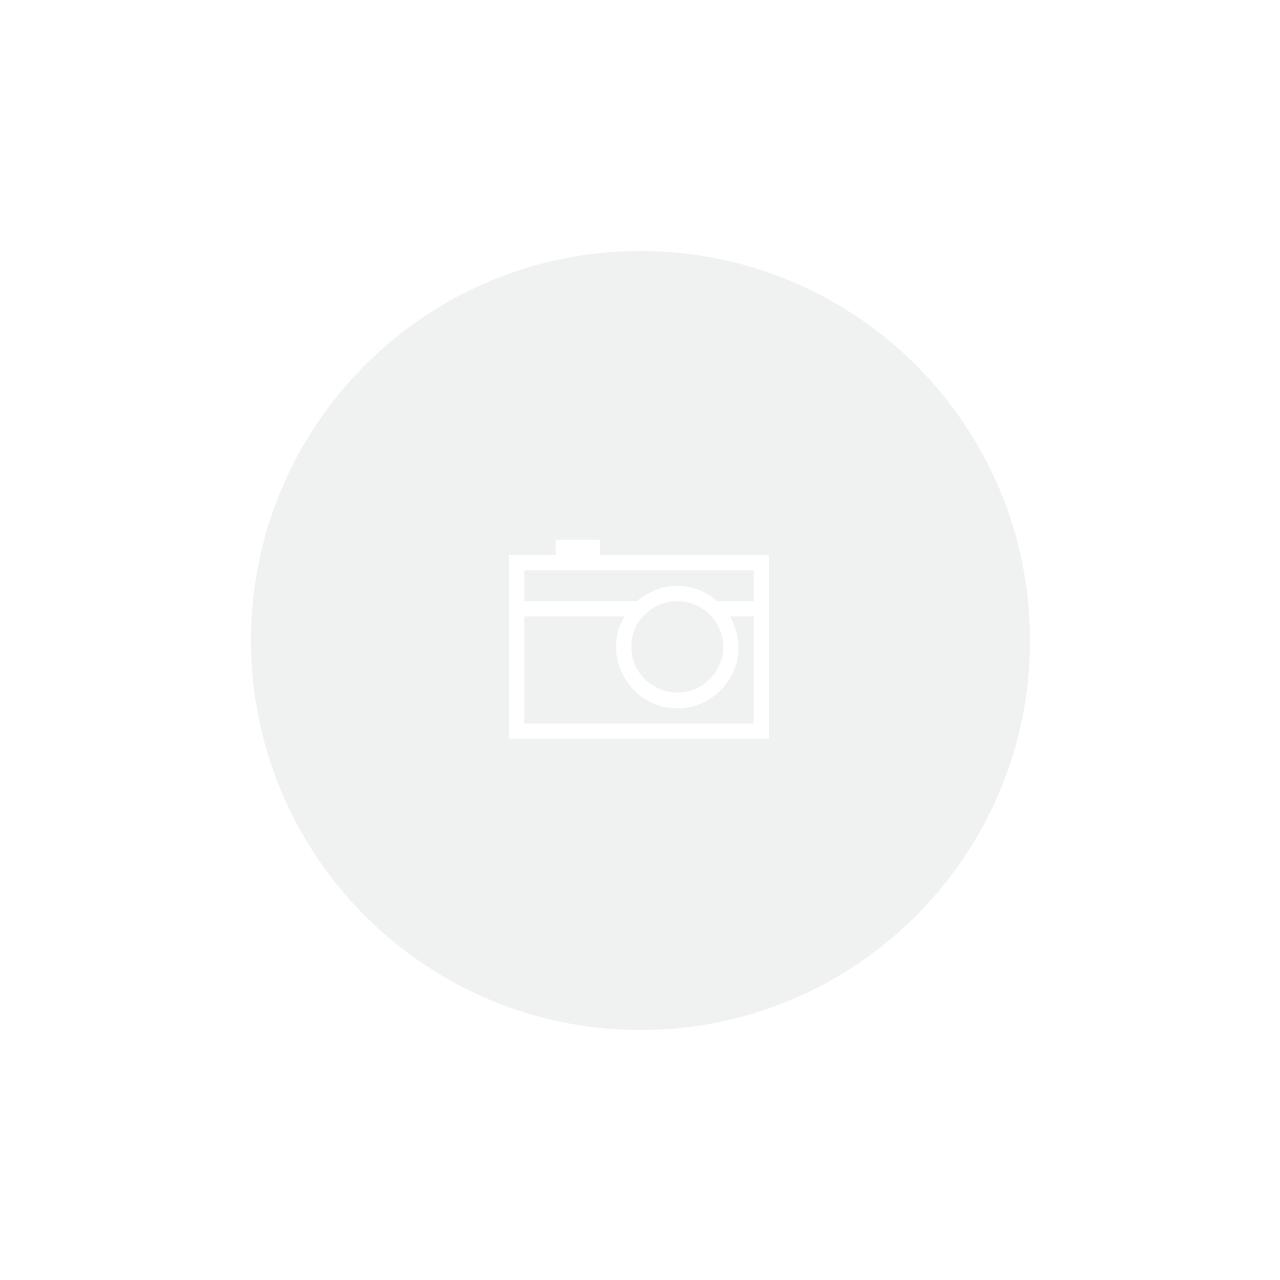 Papel Artesanal Indiano - Ref. 84